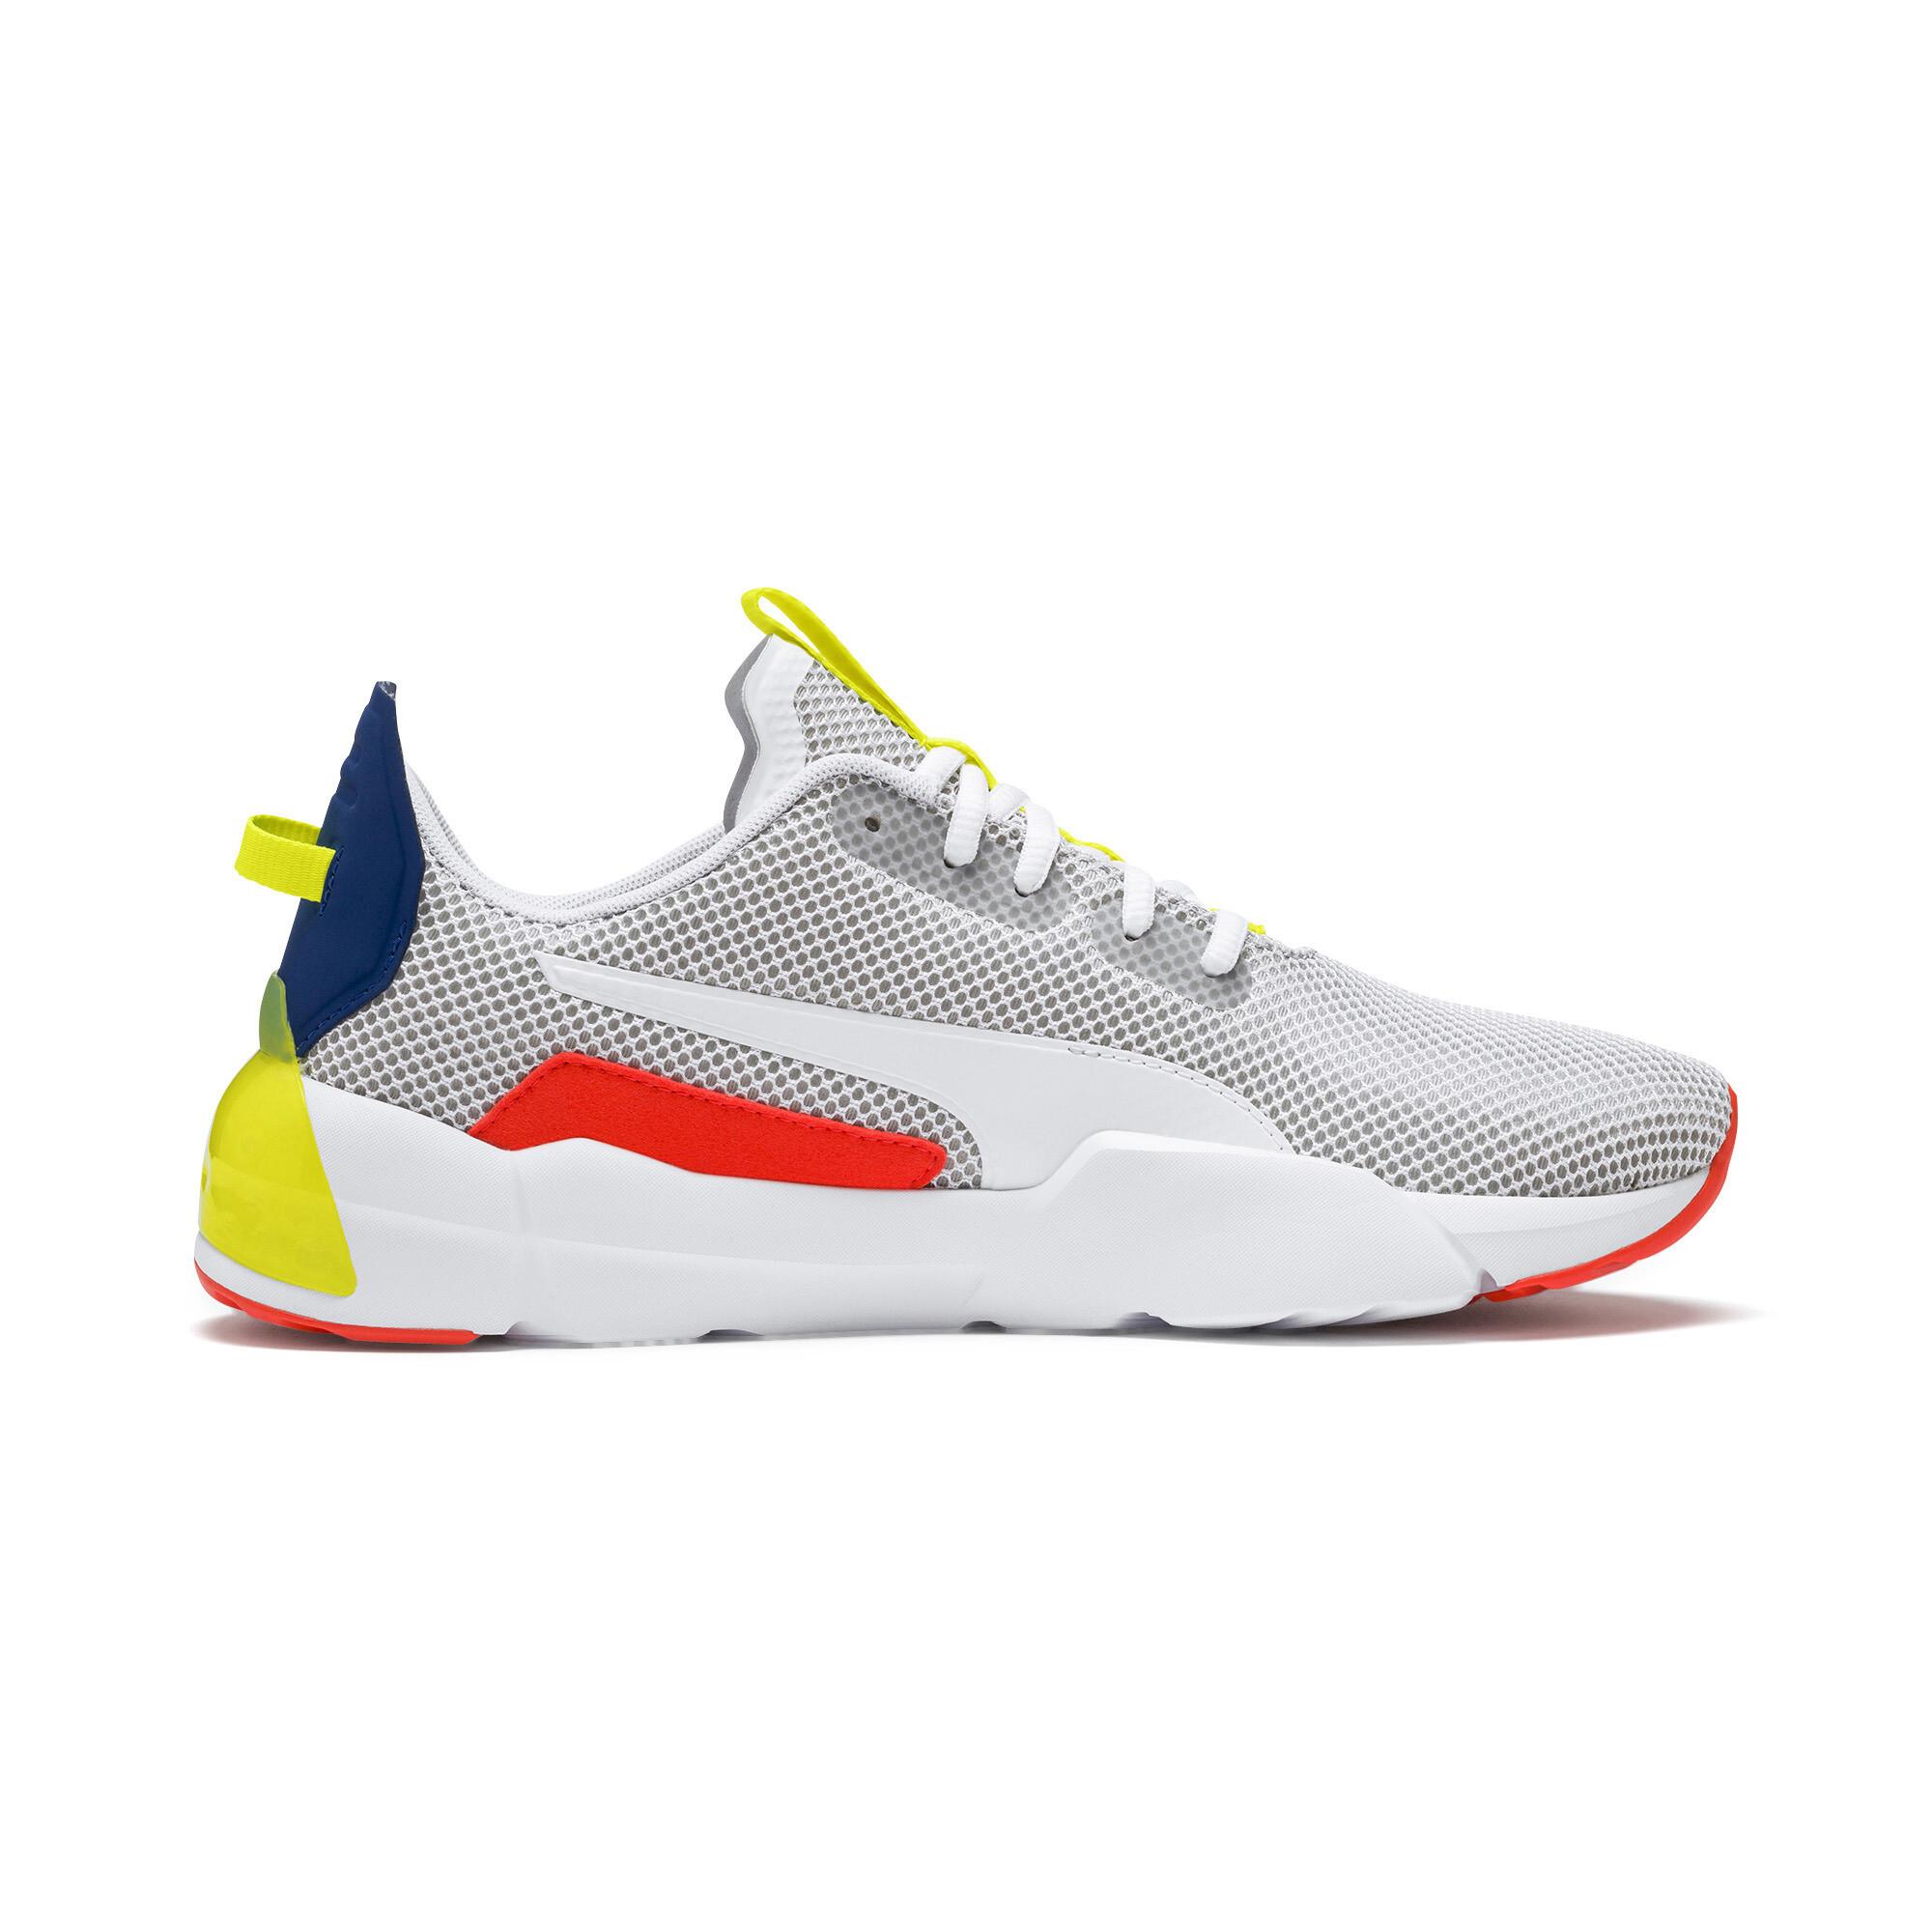 PUMA-CELL-Phase-Men-s-Training-Shoes-Men-Shoe-Running miniatura 7